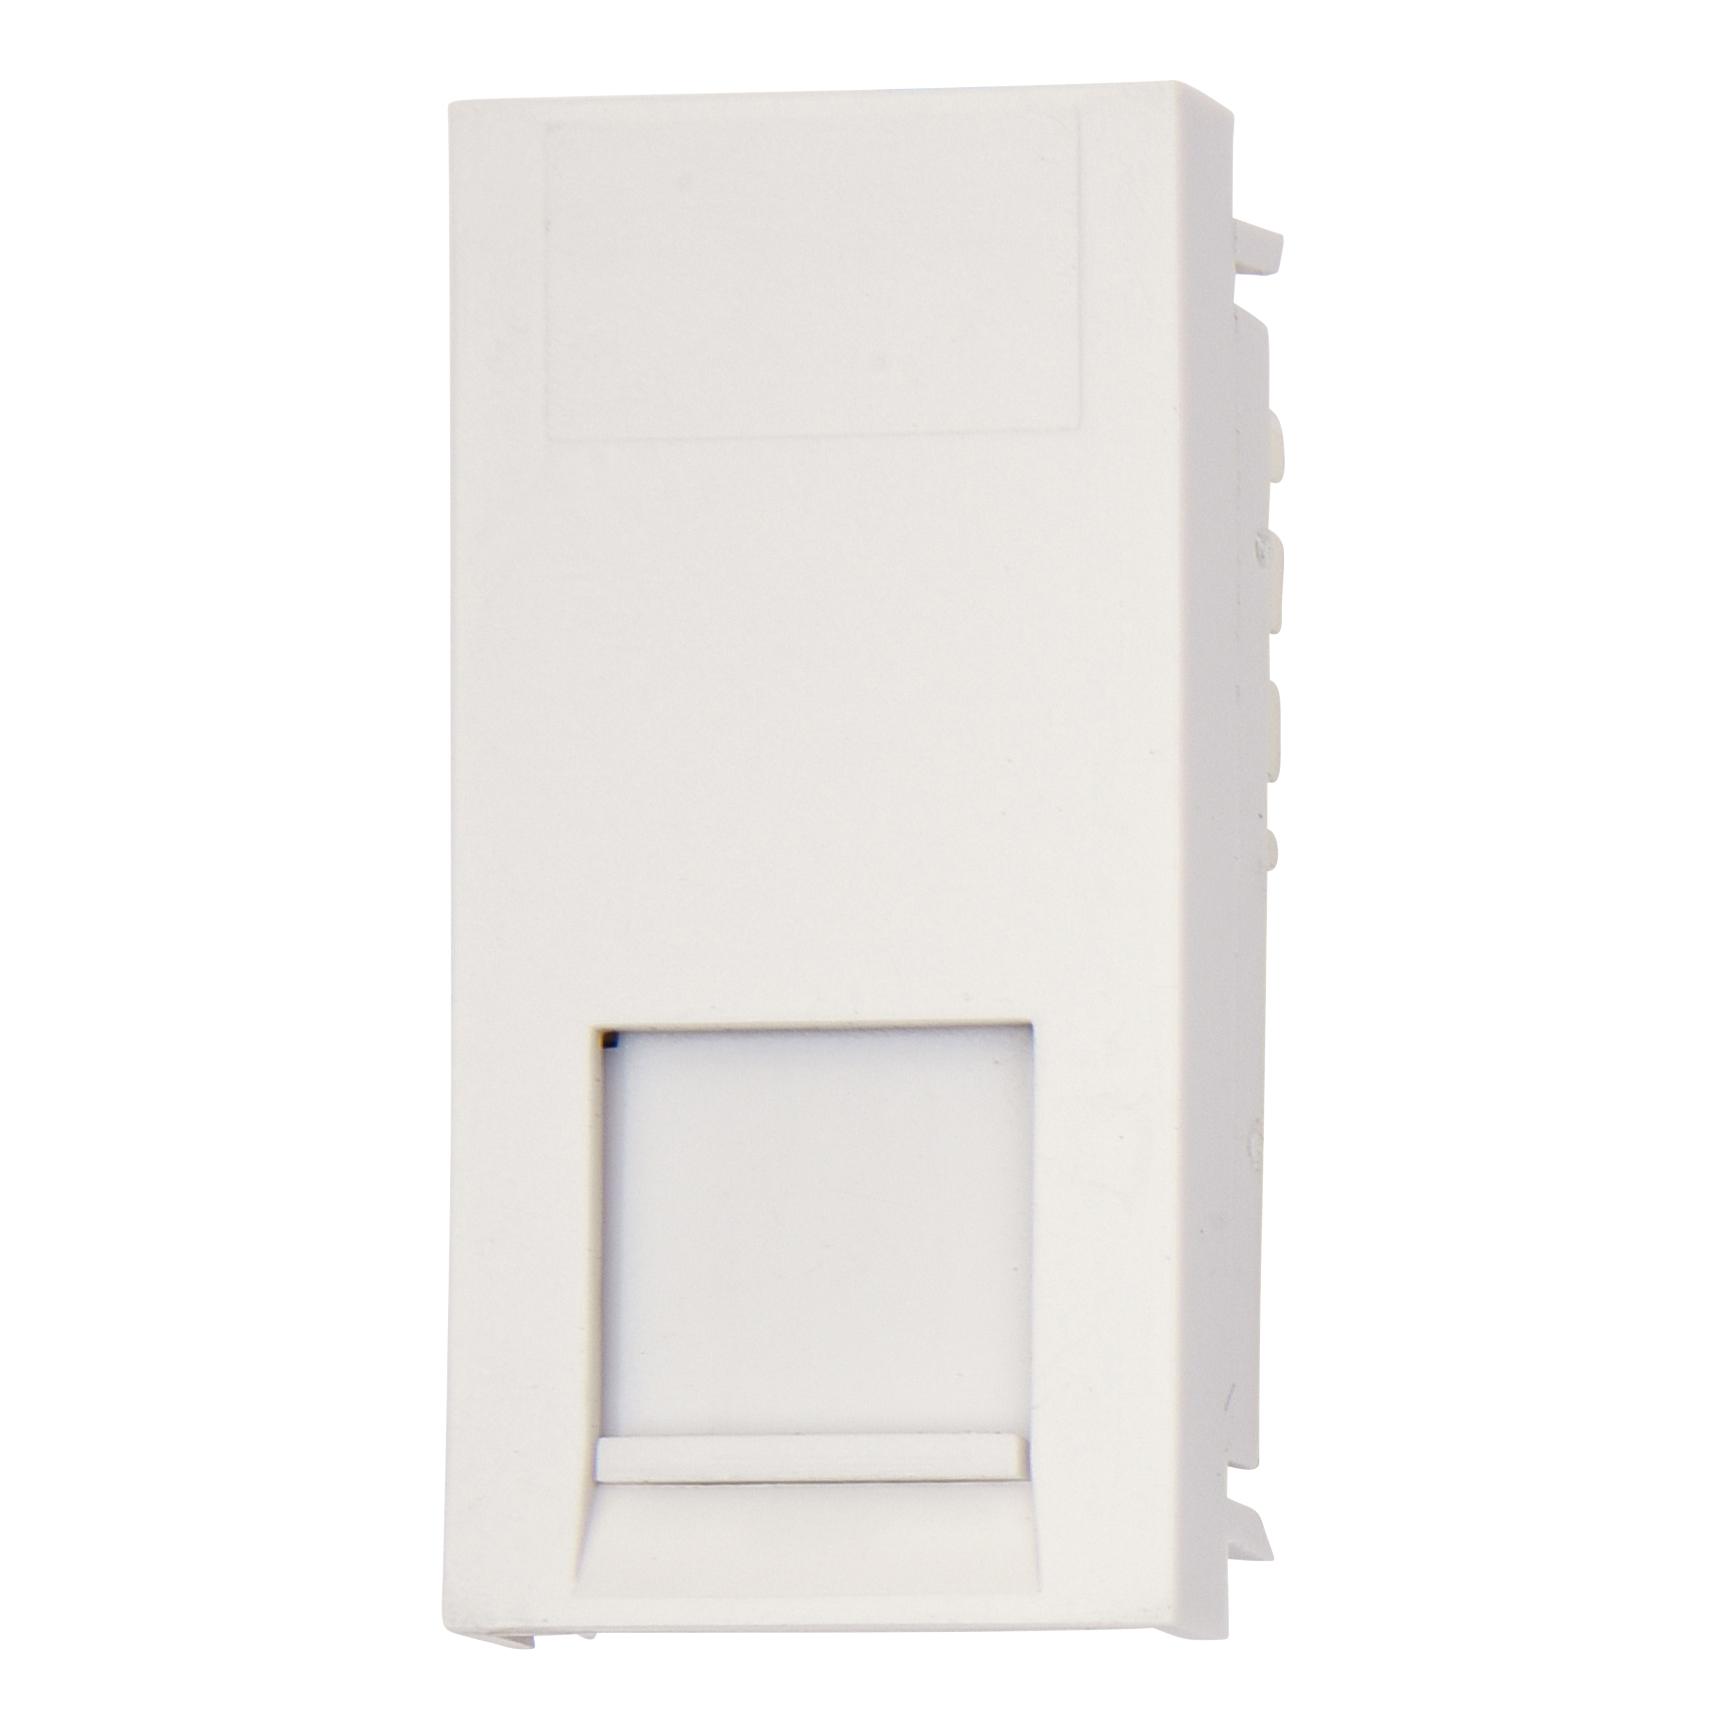 Deta RJ11 Master Telephone Module - White